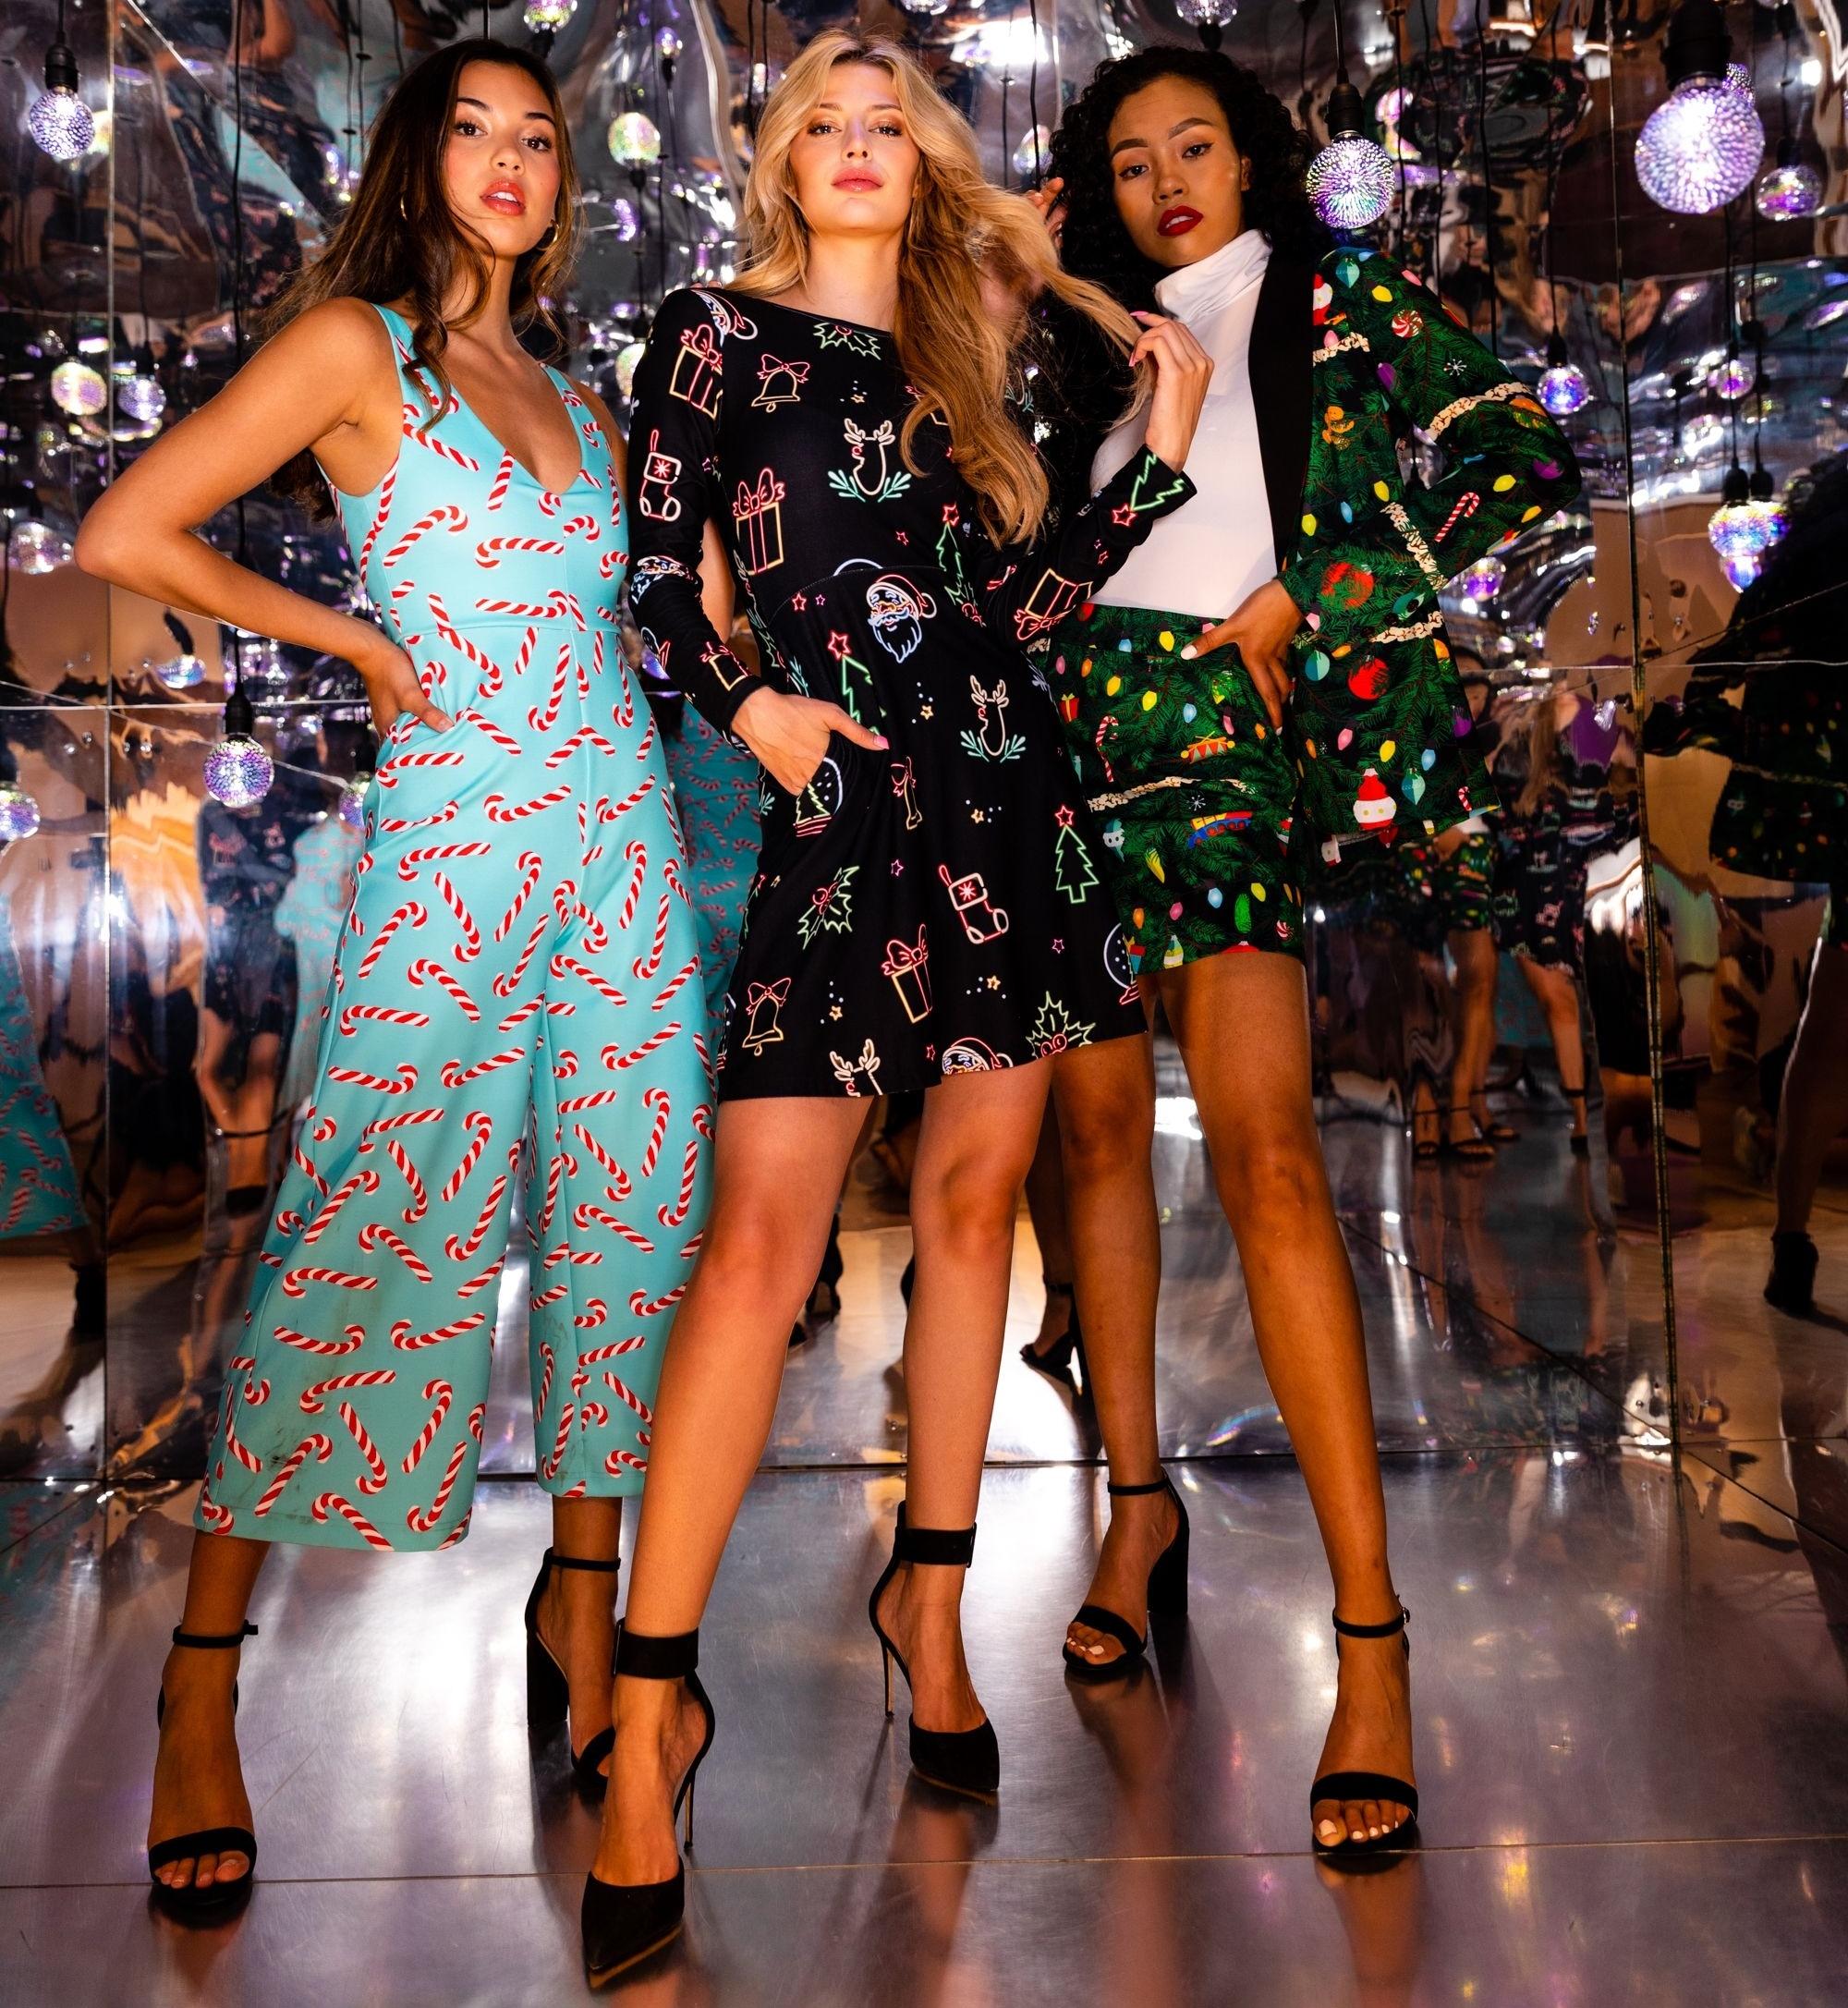 Shinesty Holiday Apparel: Holi-Slay in These Festive Fashions